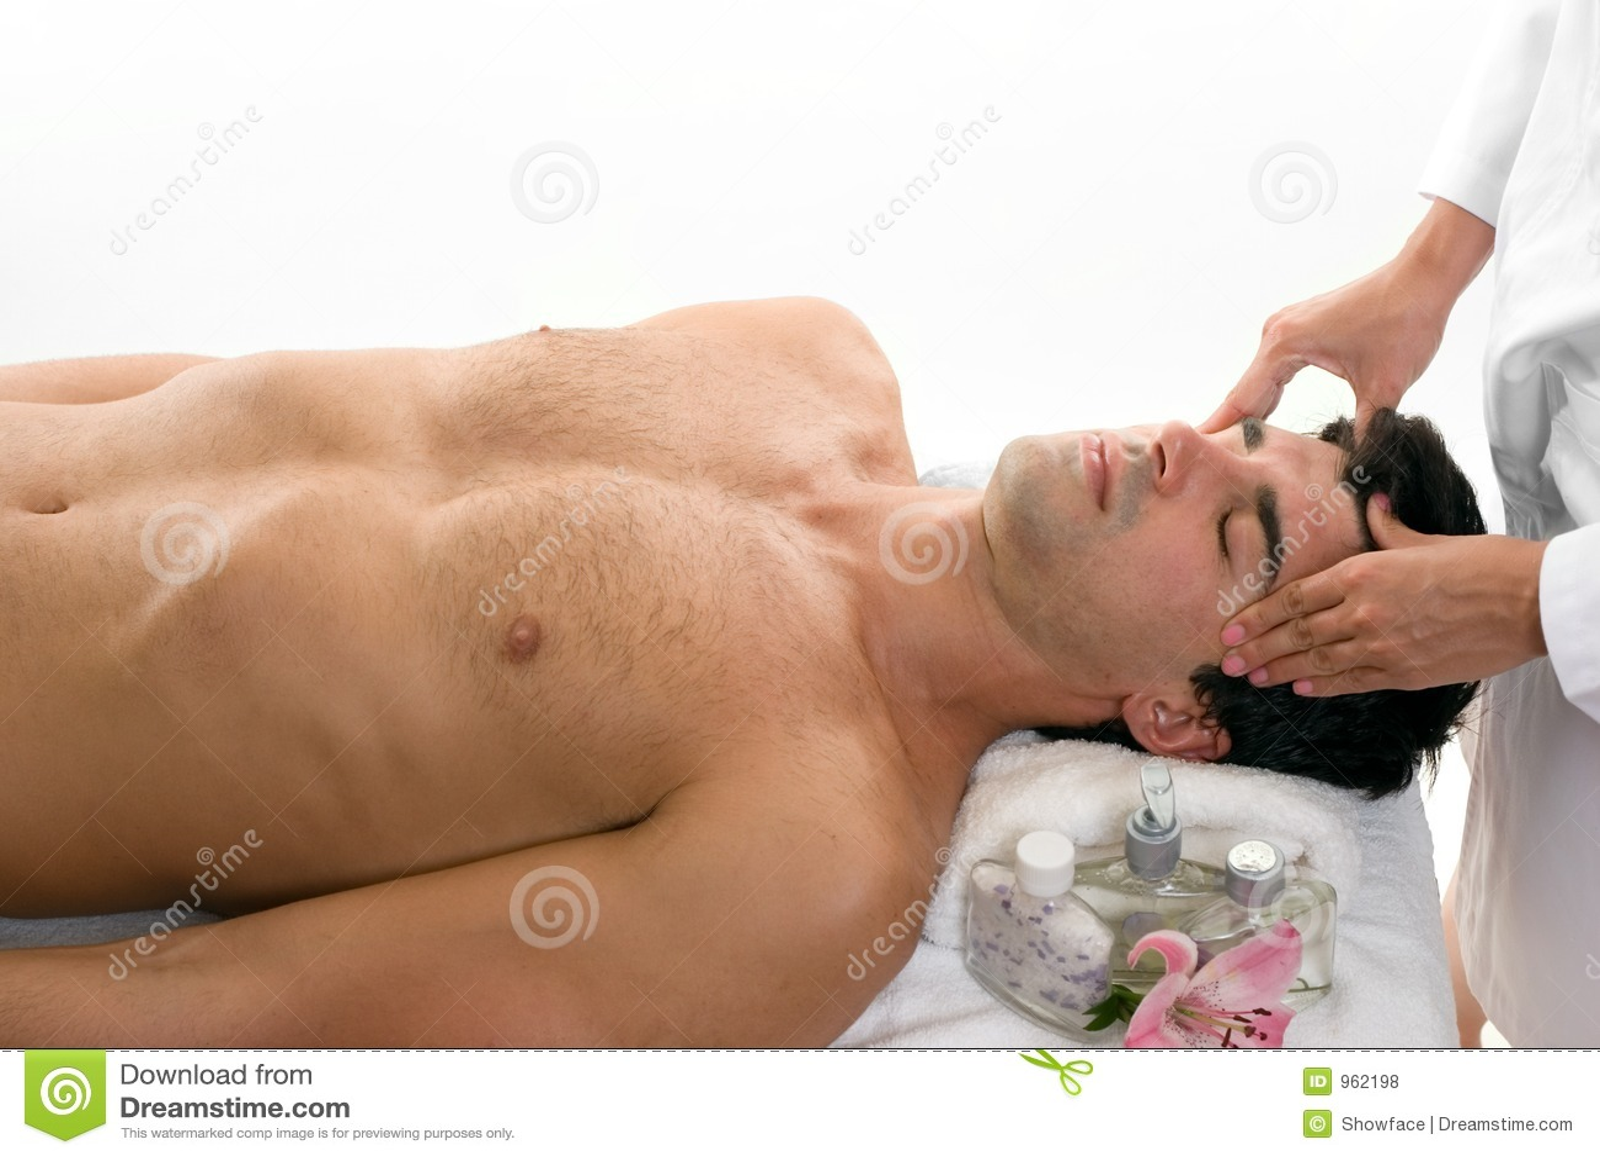 Gay massage download